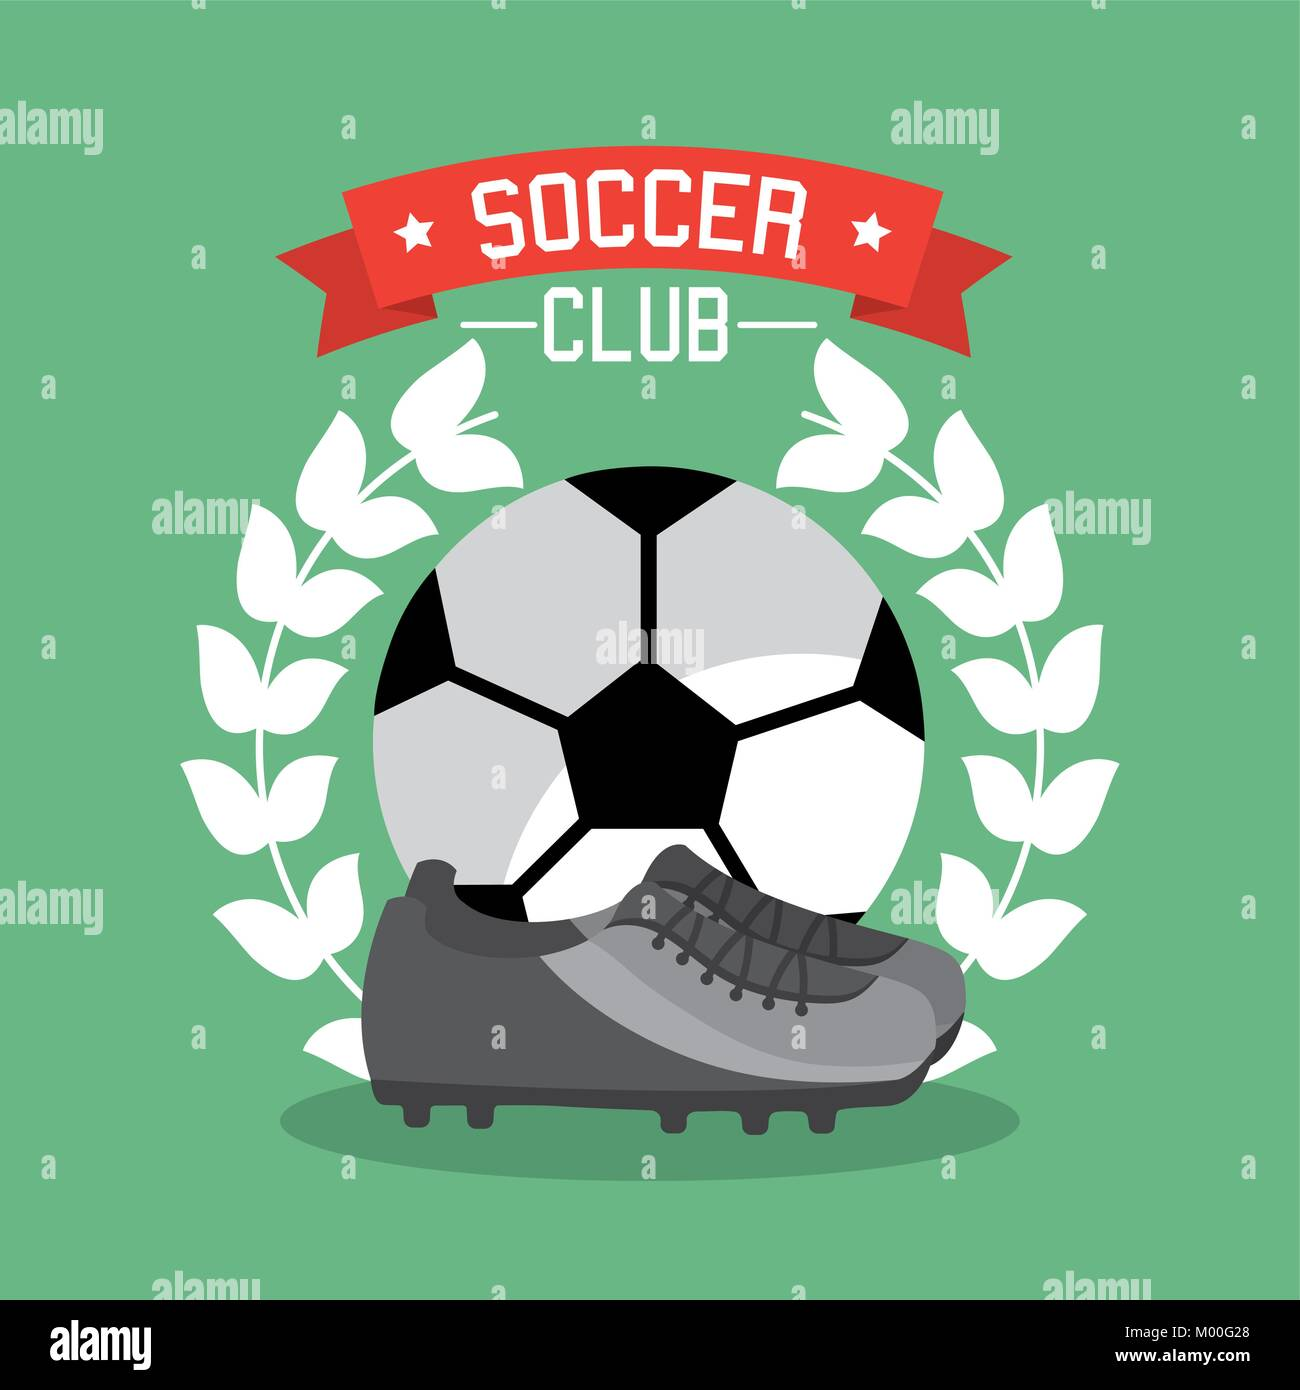 soccer club ball sneaker laurel championship - Stock Vector